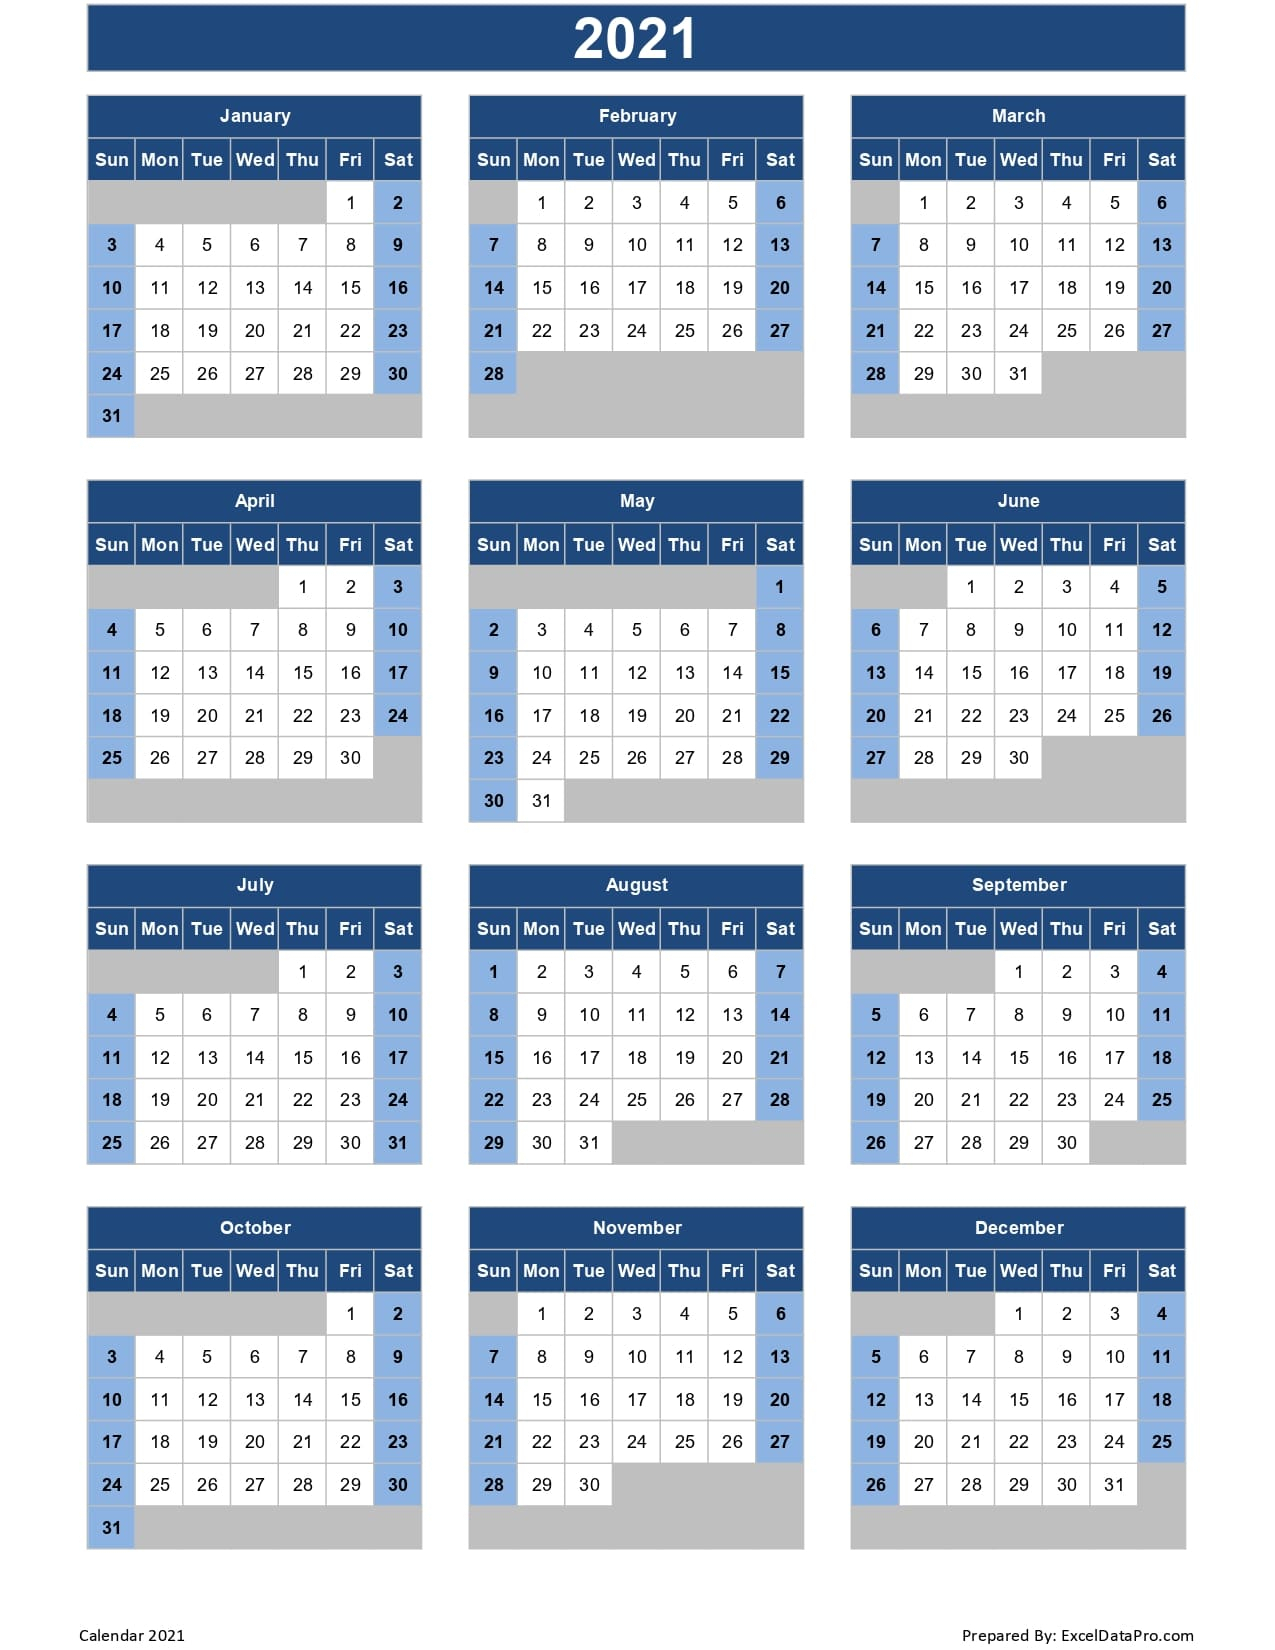 Julian Calendar 2021 Excel | Free Printable Calendar